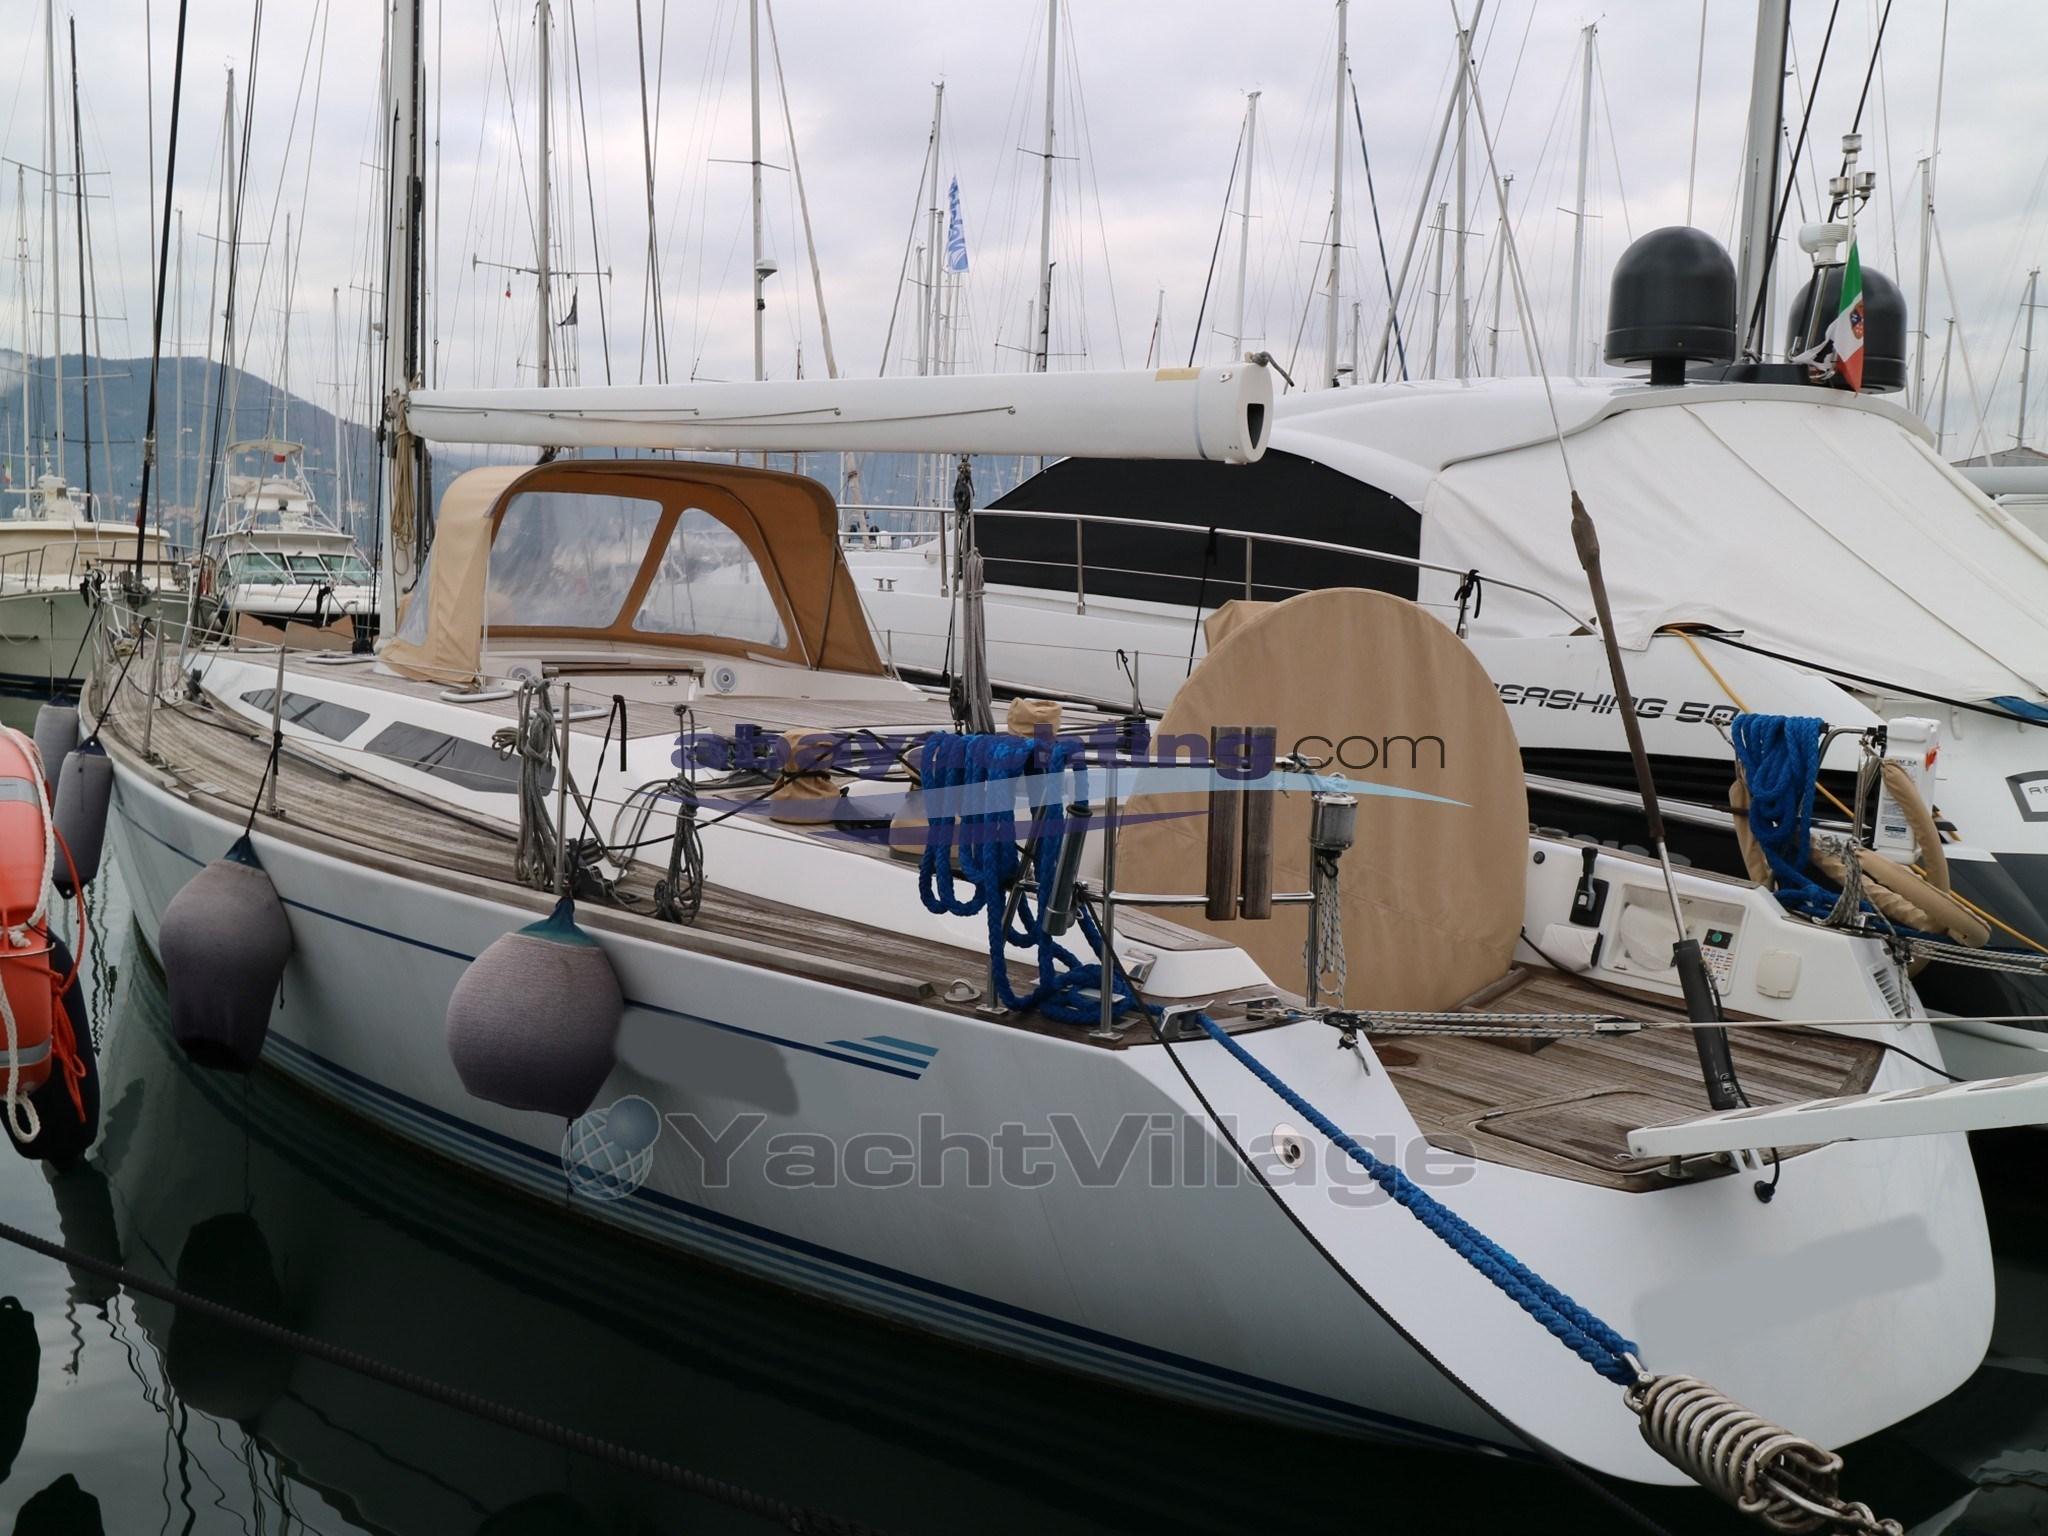 Abayachting Baltic 50 usato-second hand 1